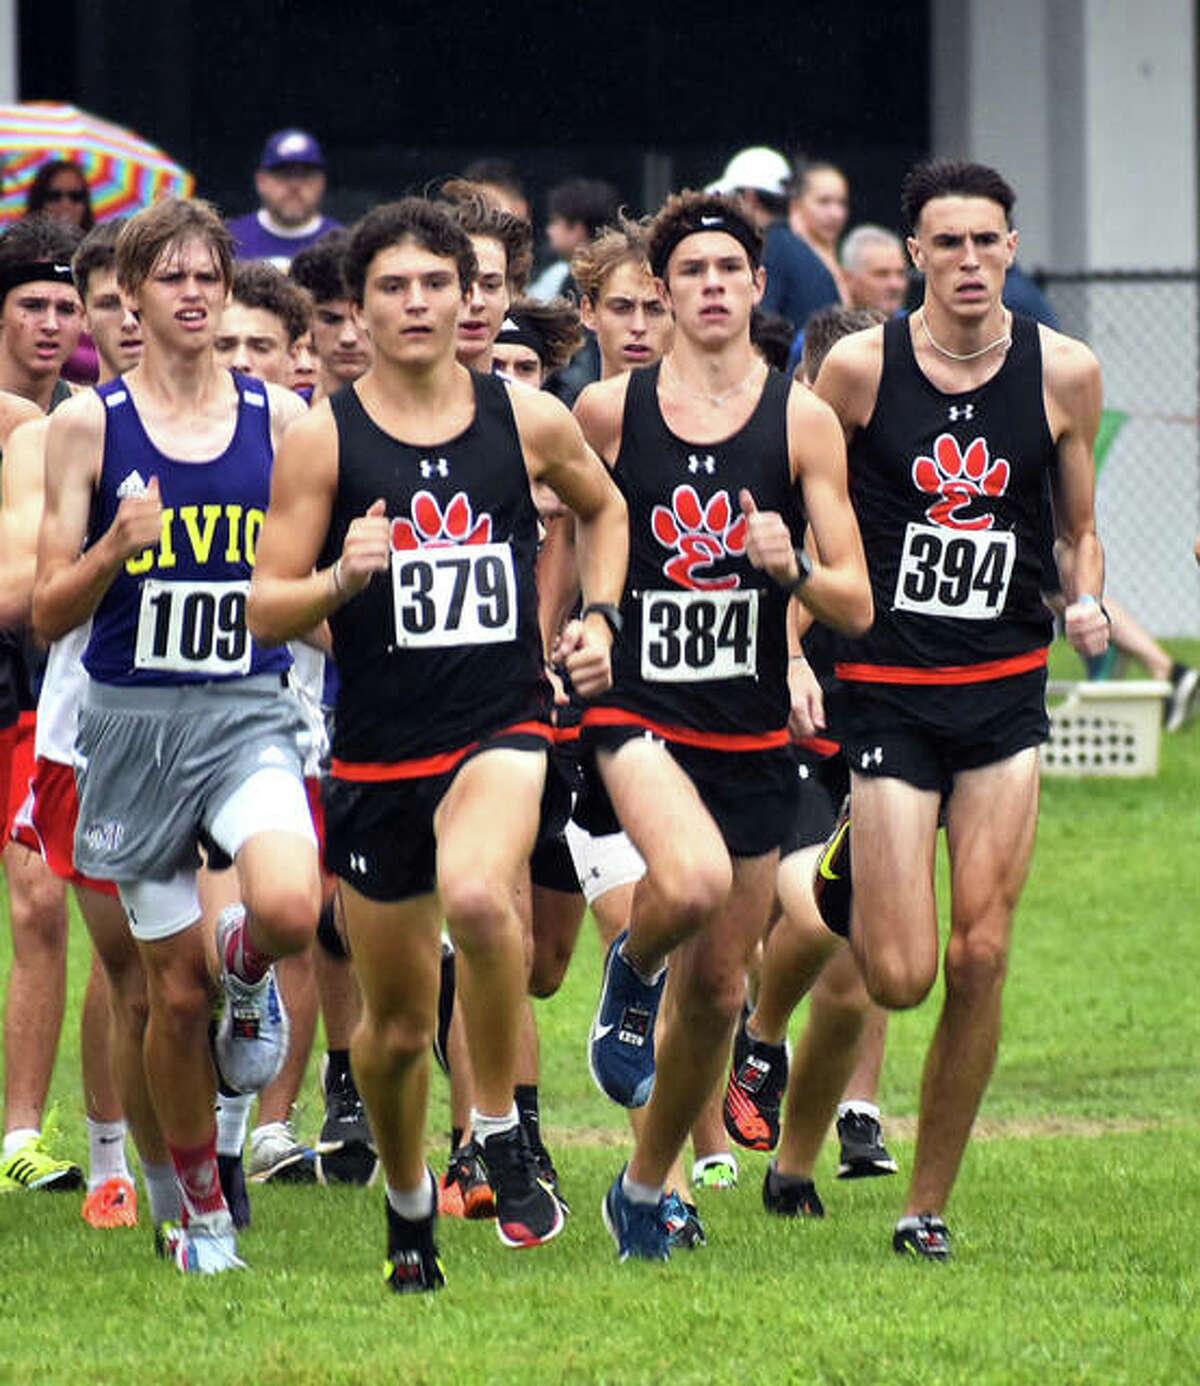 Edwardsville senior Ryan Watts, right, runs with teammates Ryan Luitjohan, second from left, and Geordan Patrylak, second from right, at the start of the Granite City Invitational.